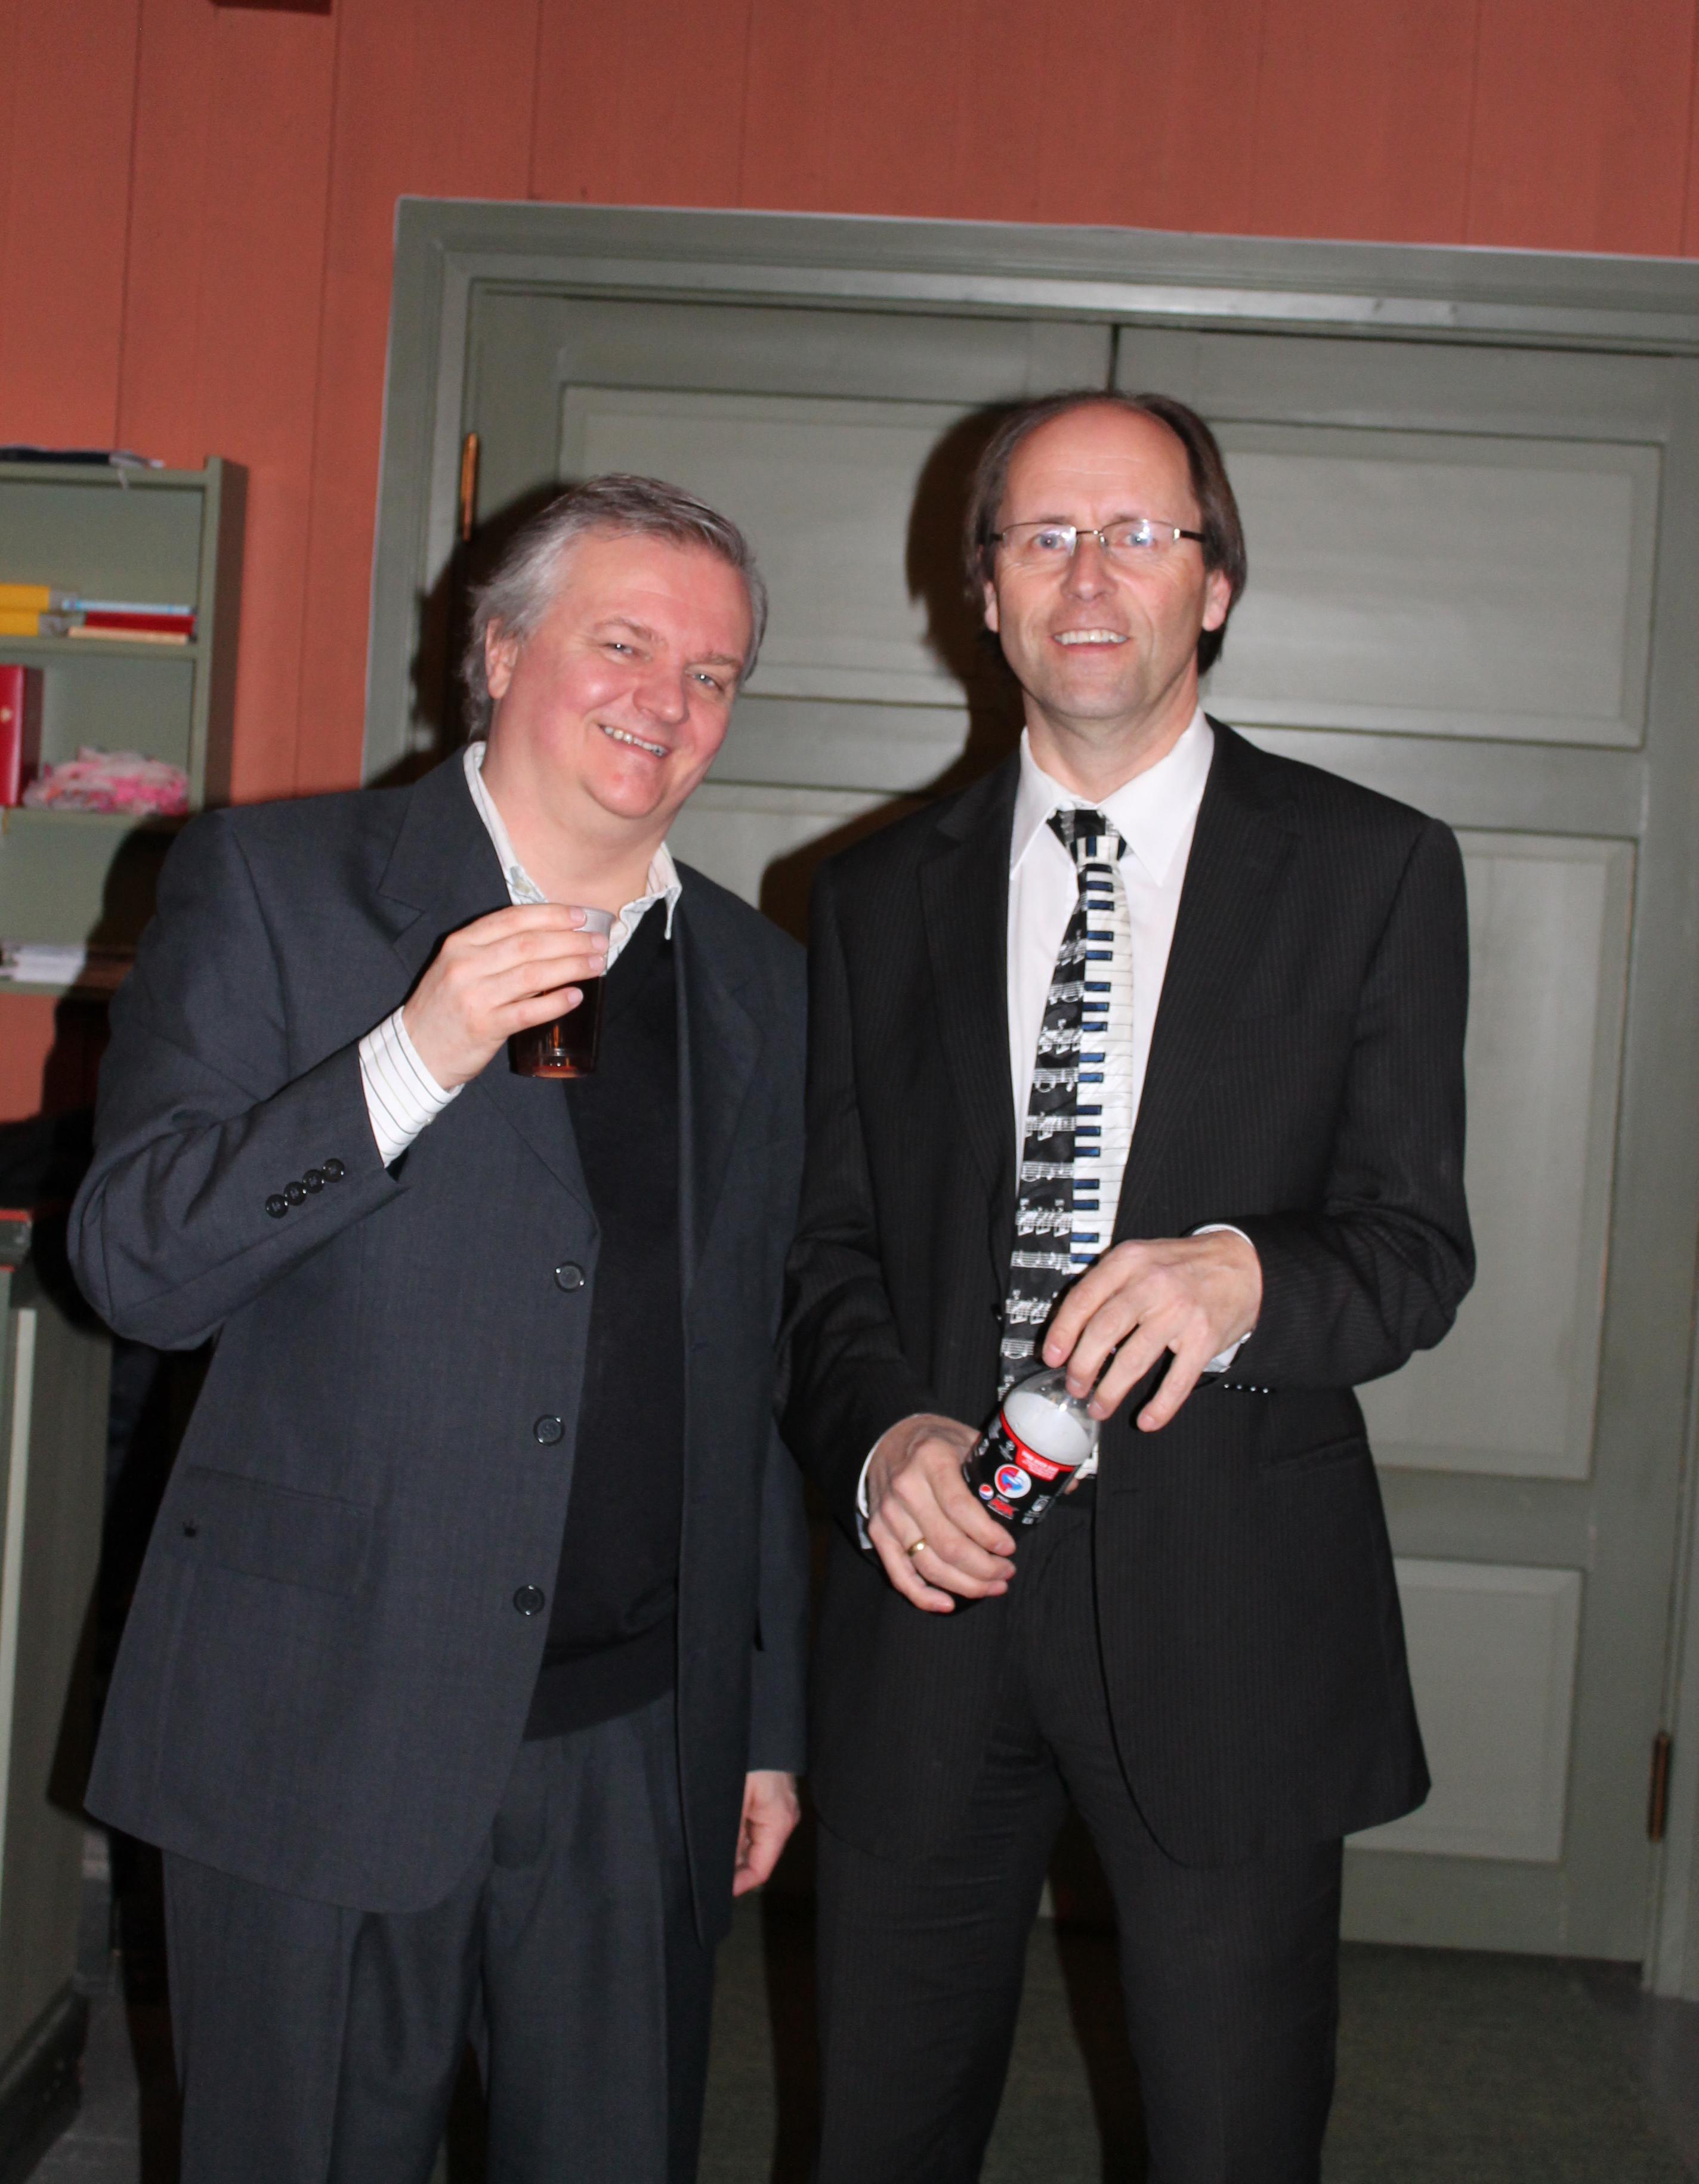 05 Konsert med Roar Engelberg Svarstad kirke 13.03.15 - 8998